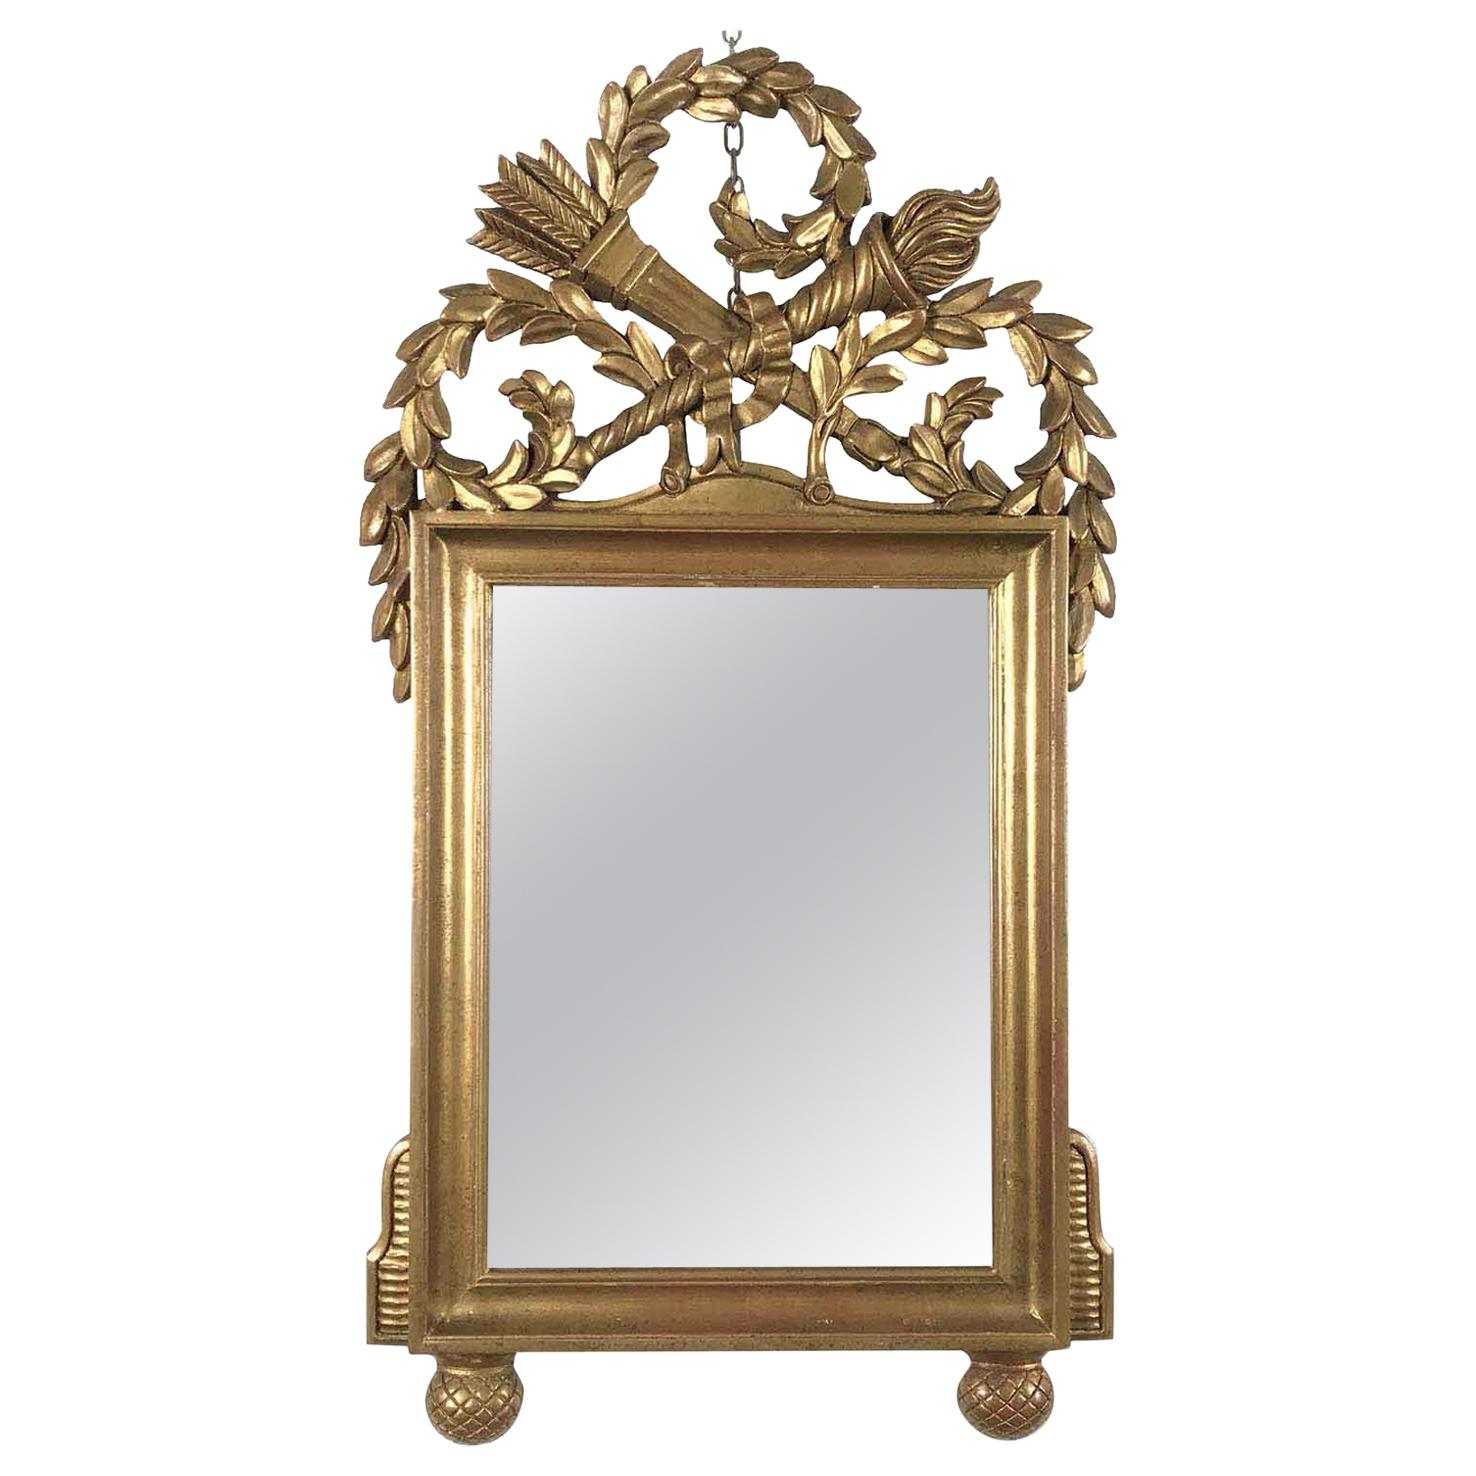 20th Century Italian Empire Style Gold Leaf Gilt Mirror by Chelini Firenze